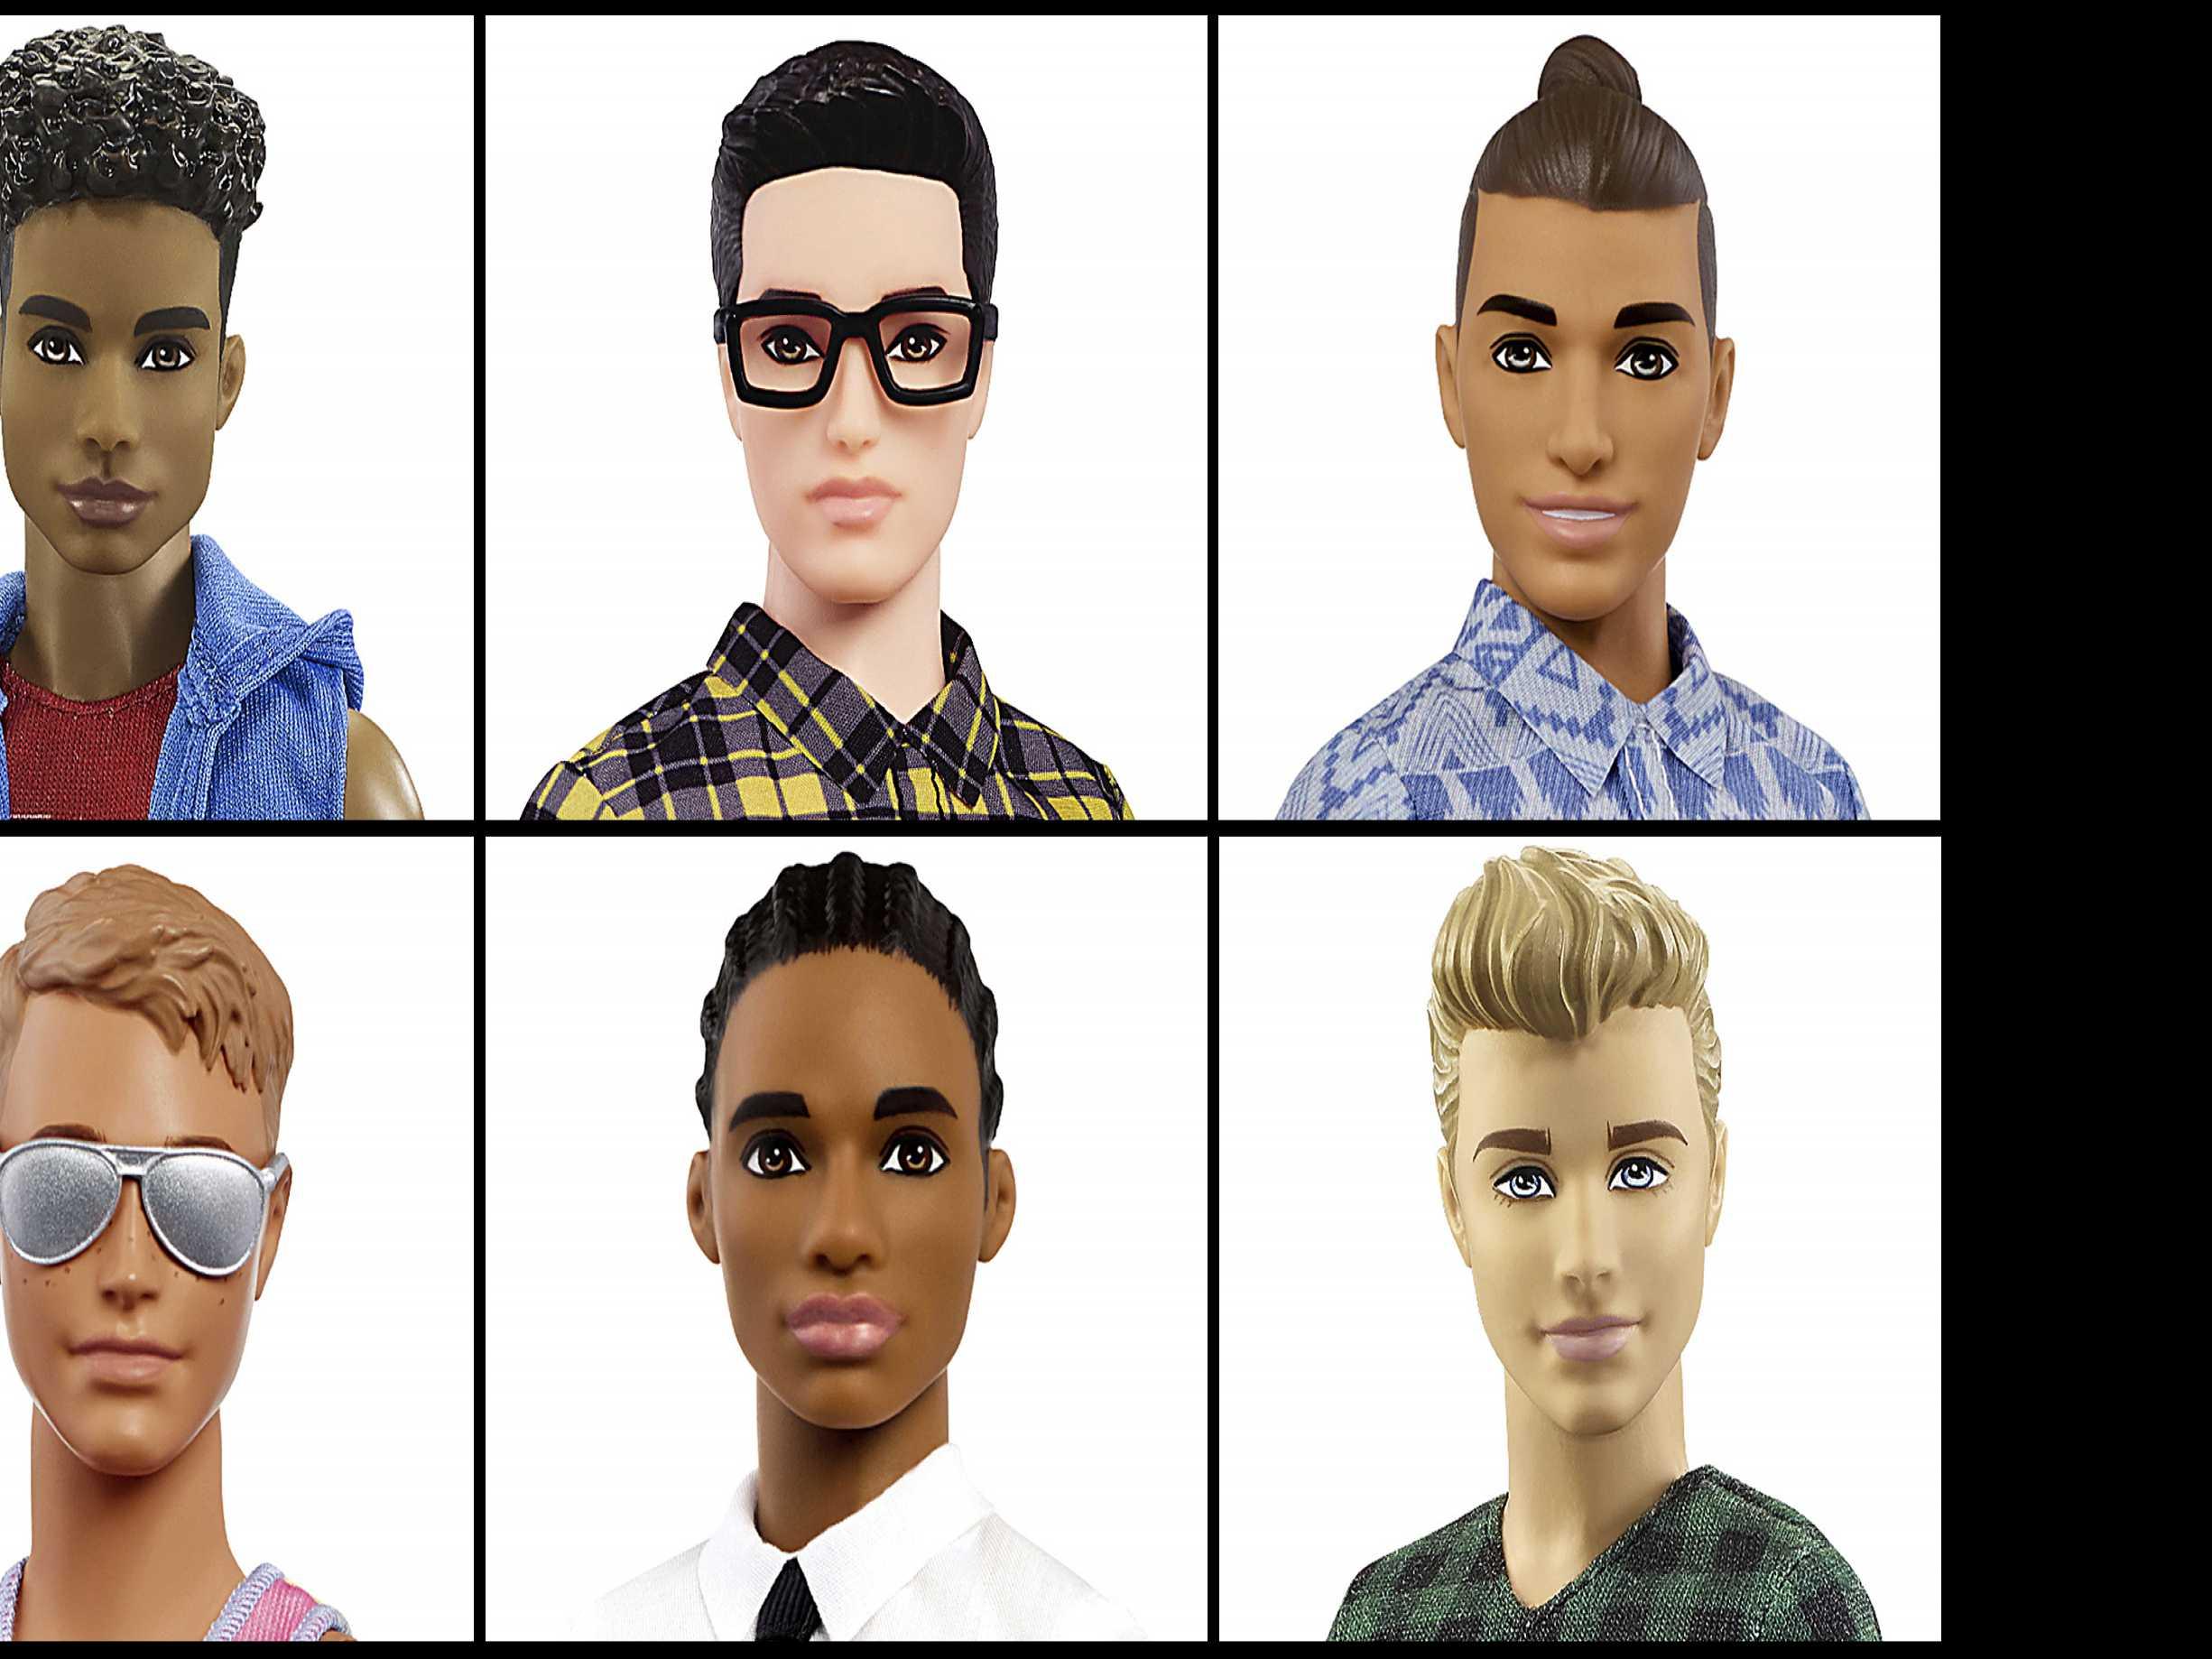 Barbie's Companion Ken Gets New Looks: Man Bun, Beefy Bod